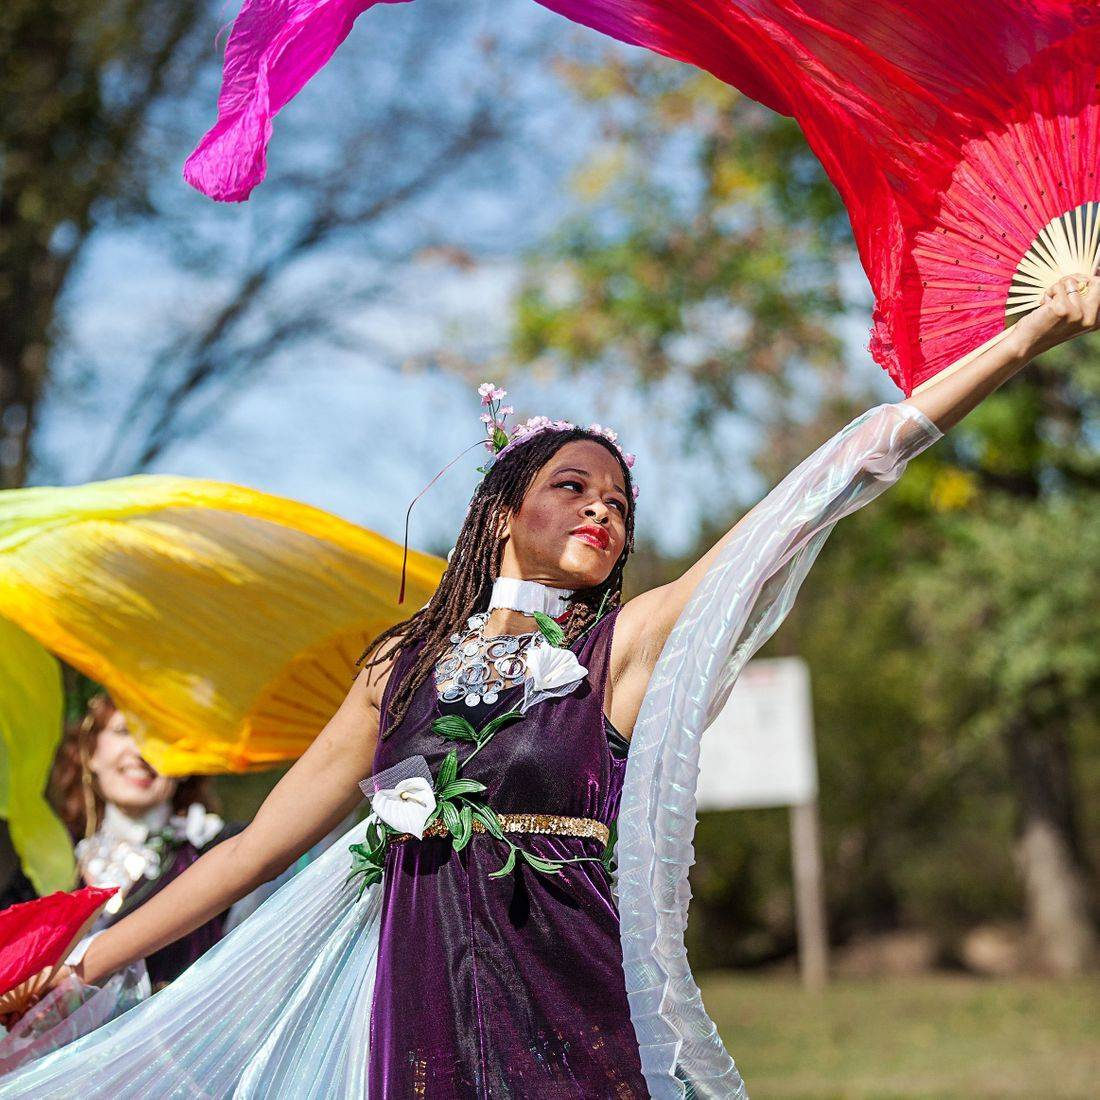 dancer, belly dancer, belly dancing, fairy dancing, creative expression,